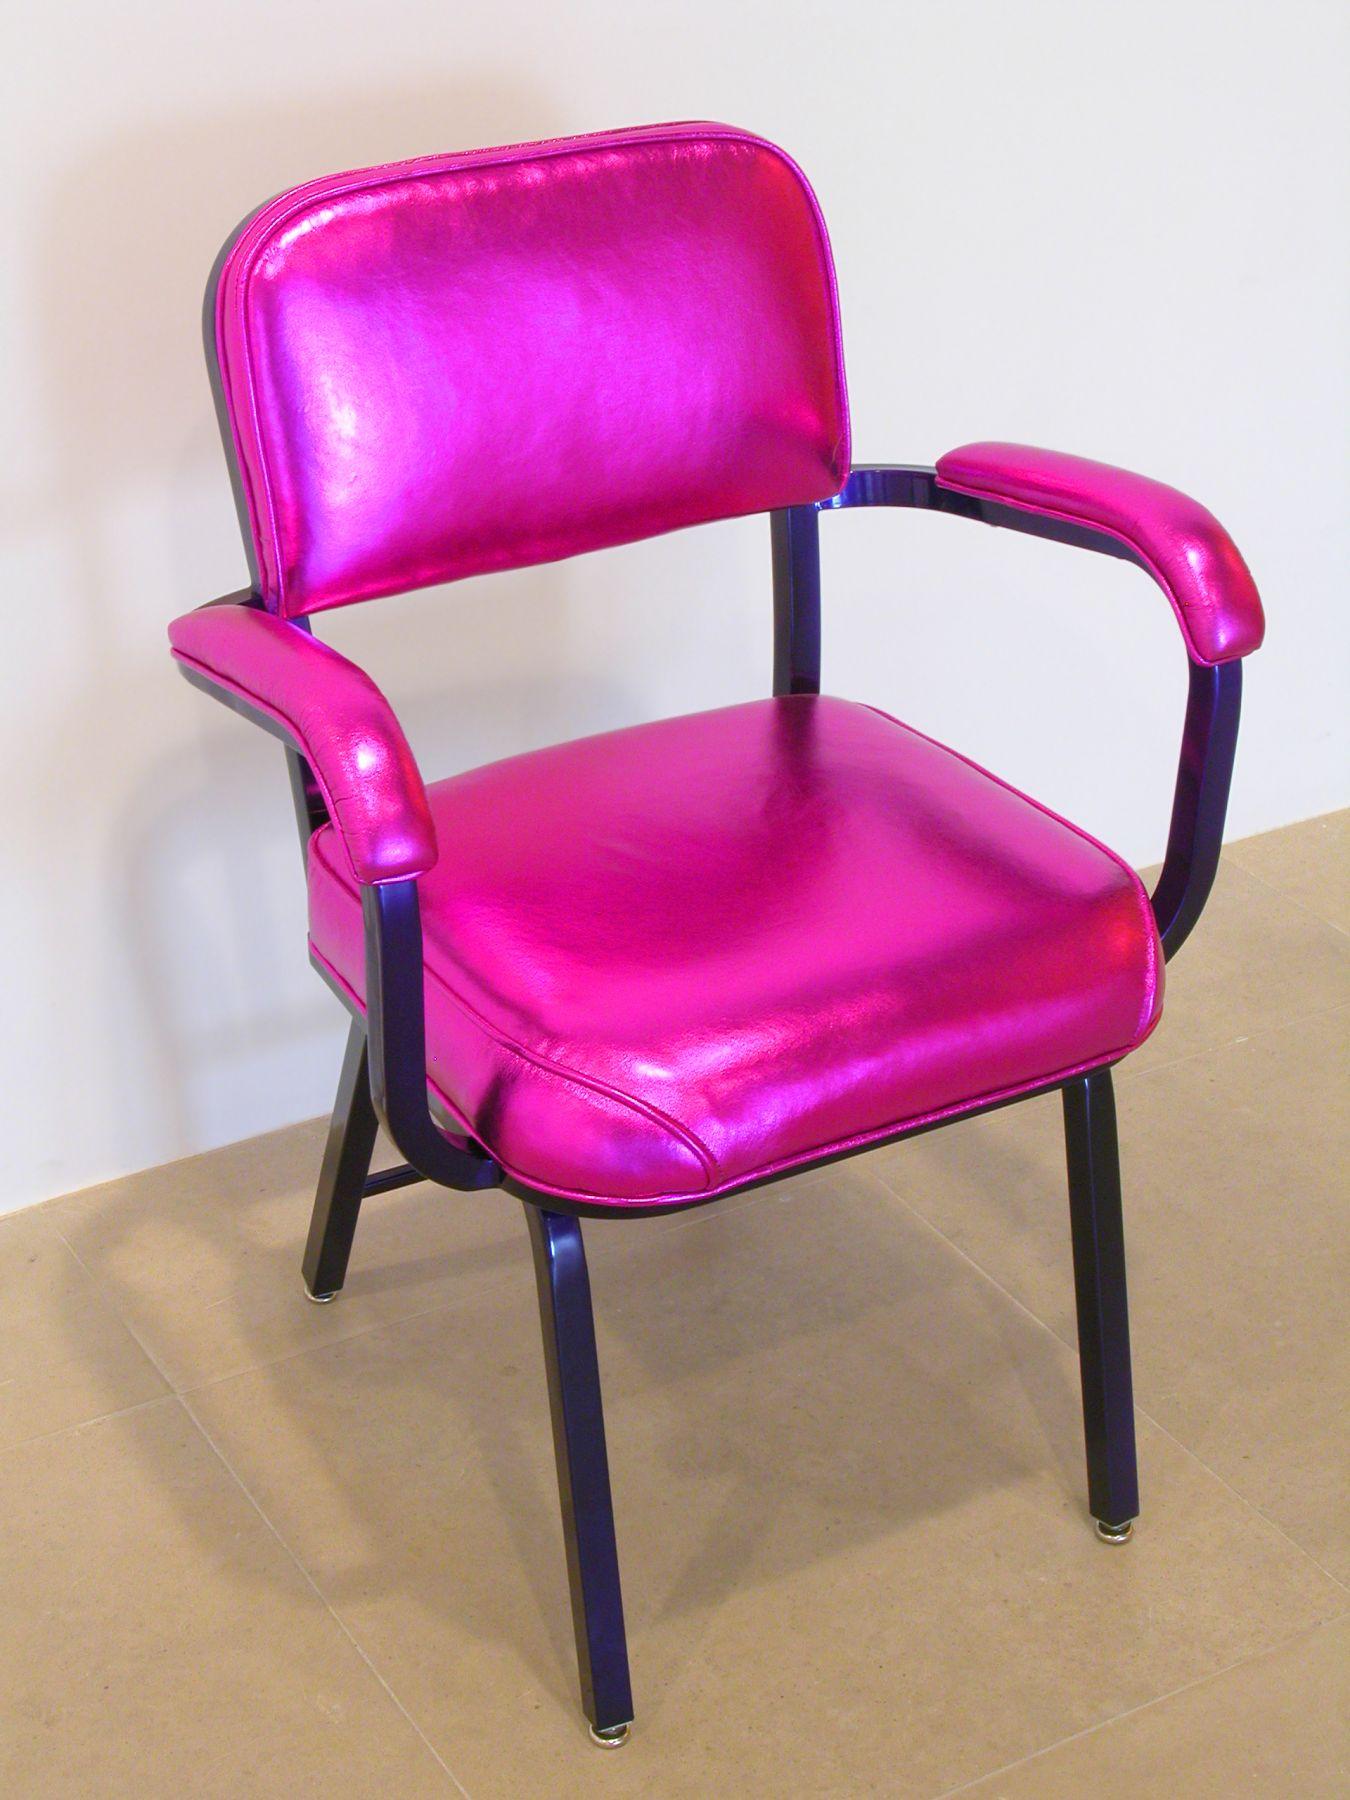 Jim Drain, Fall River Chair, 2007, Grape Candy powder coated square tube steel, metallic fuschia goat skin leather, 34 x 19 x 24 inches